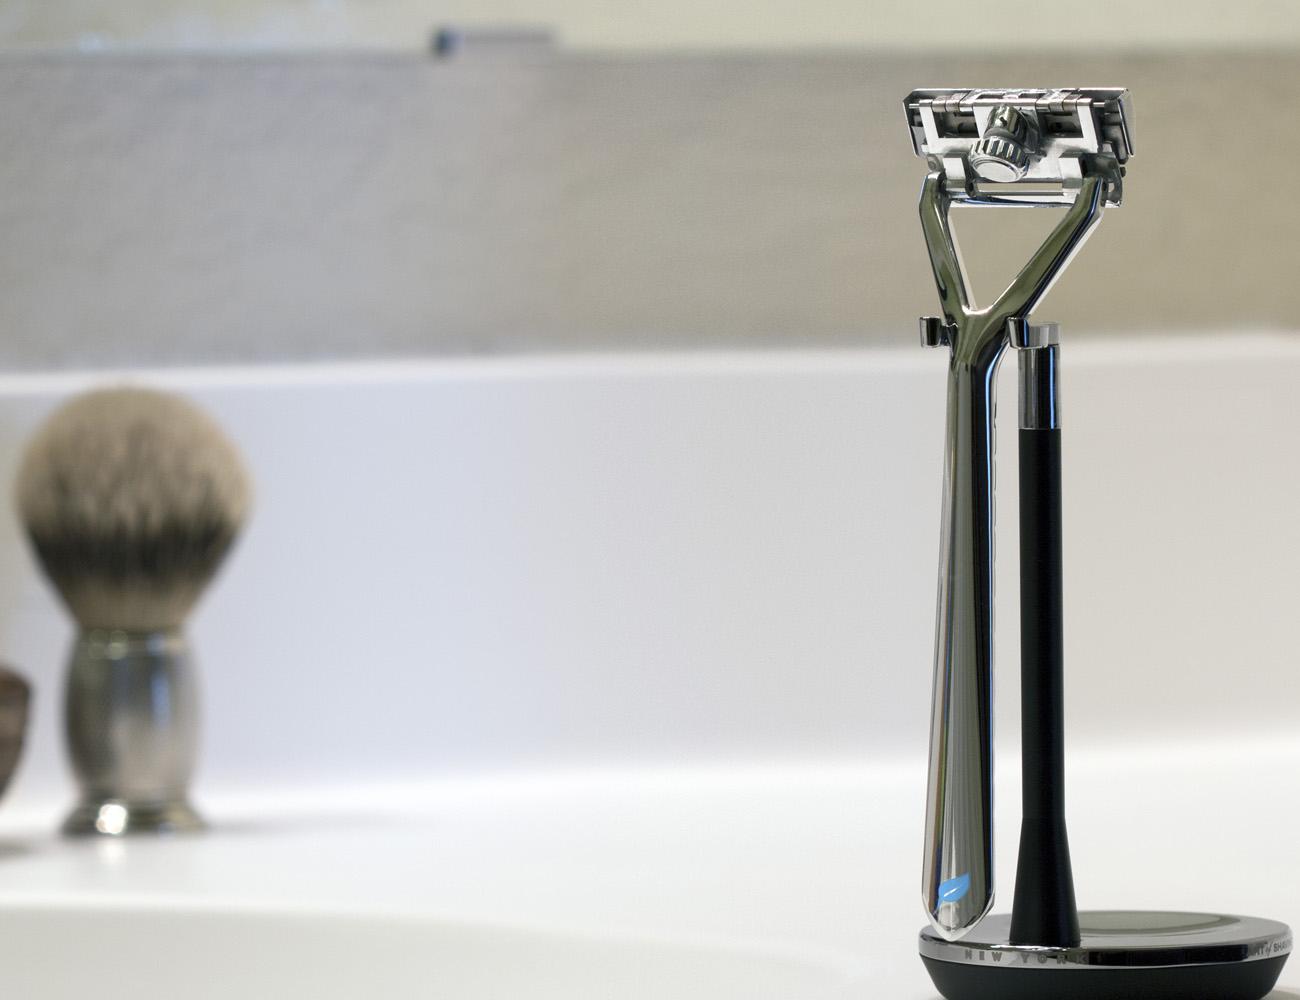 Leaf Razor – Shave For Cents, Not Dollars